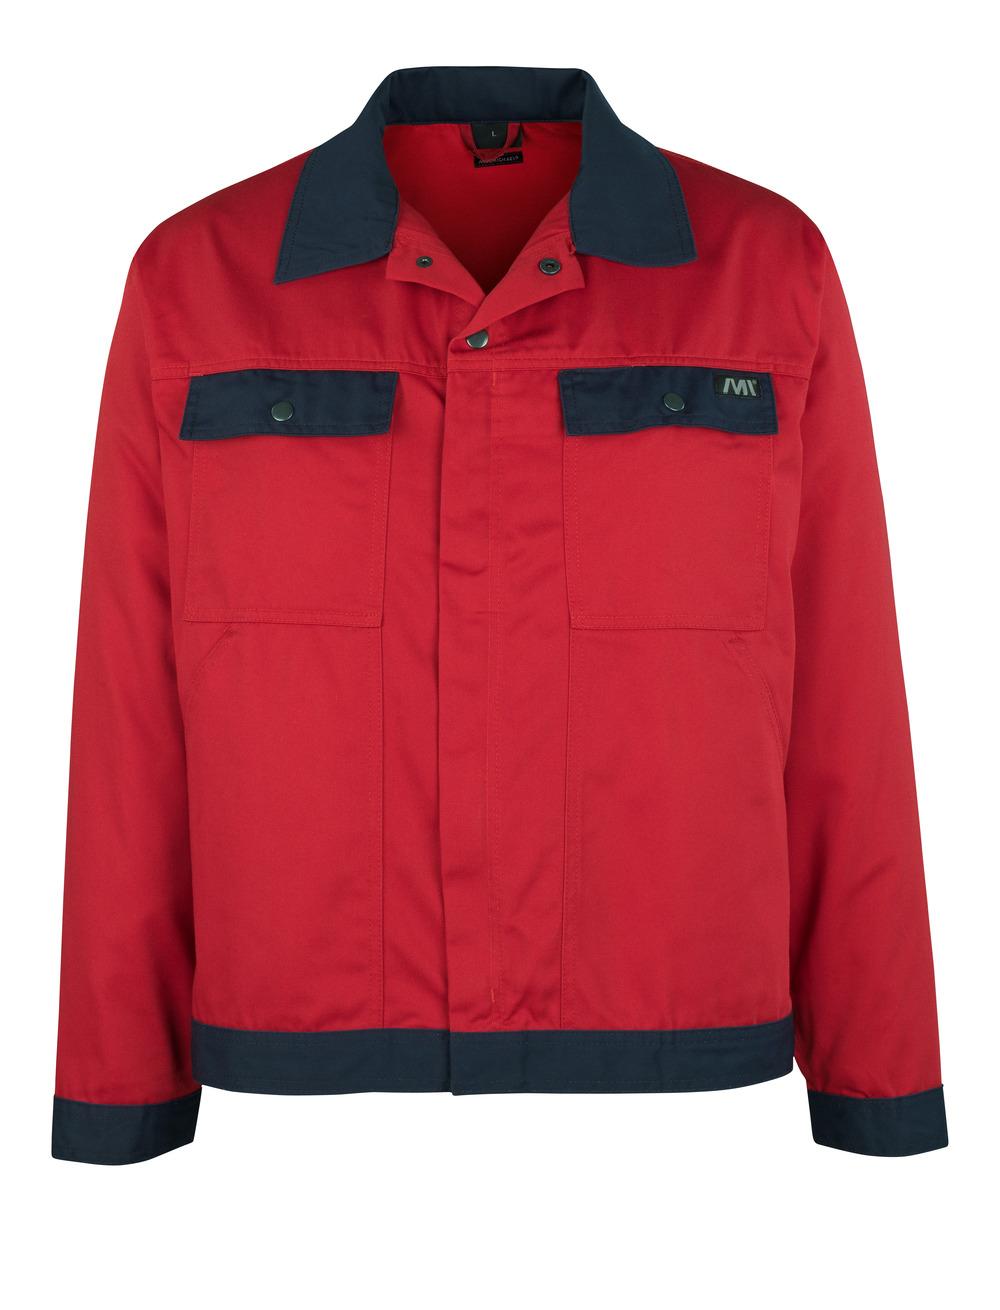 04509-800-21 Jacke - Rot/Marine